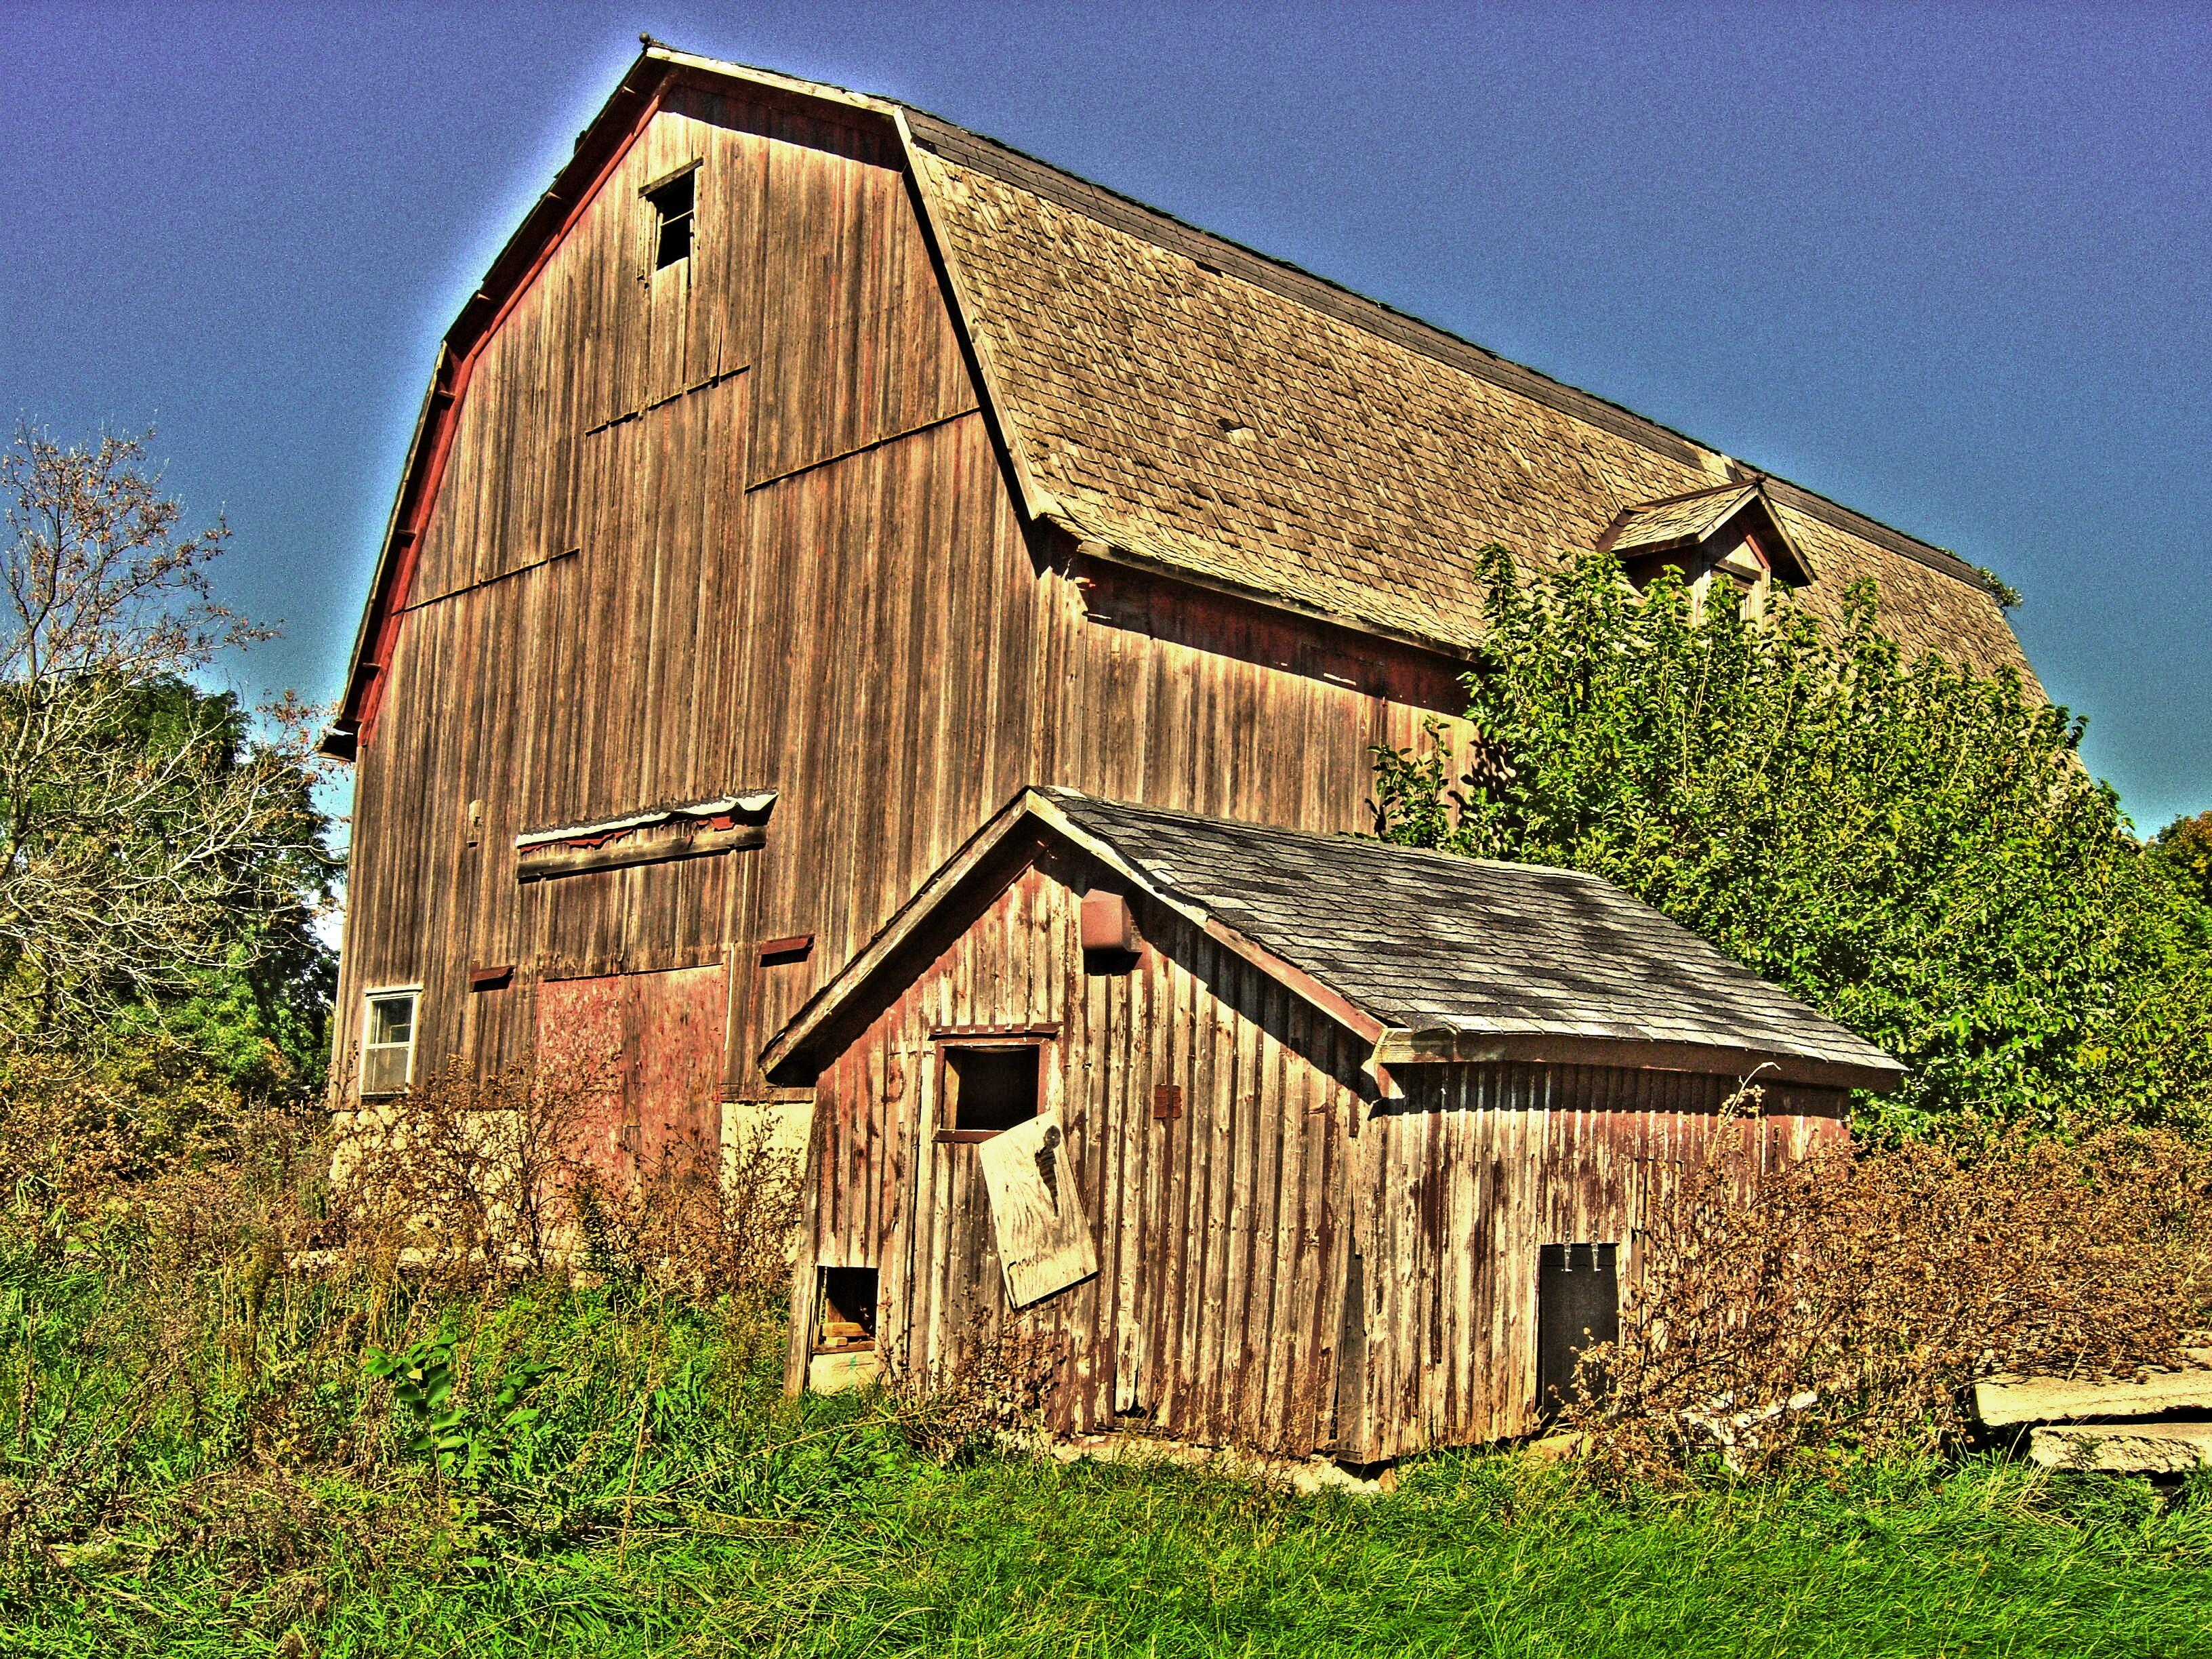 Fotos gratis : granja, techo, edificio, granero, cobertizo, choza ...